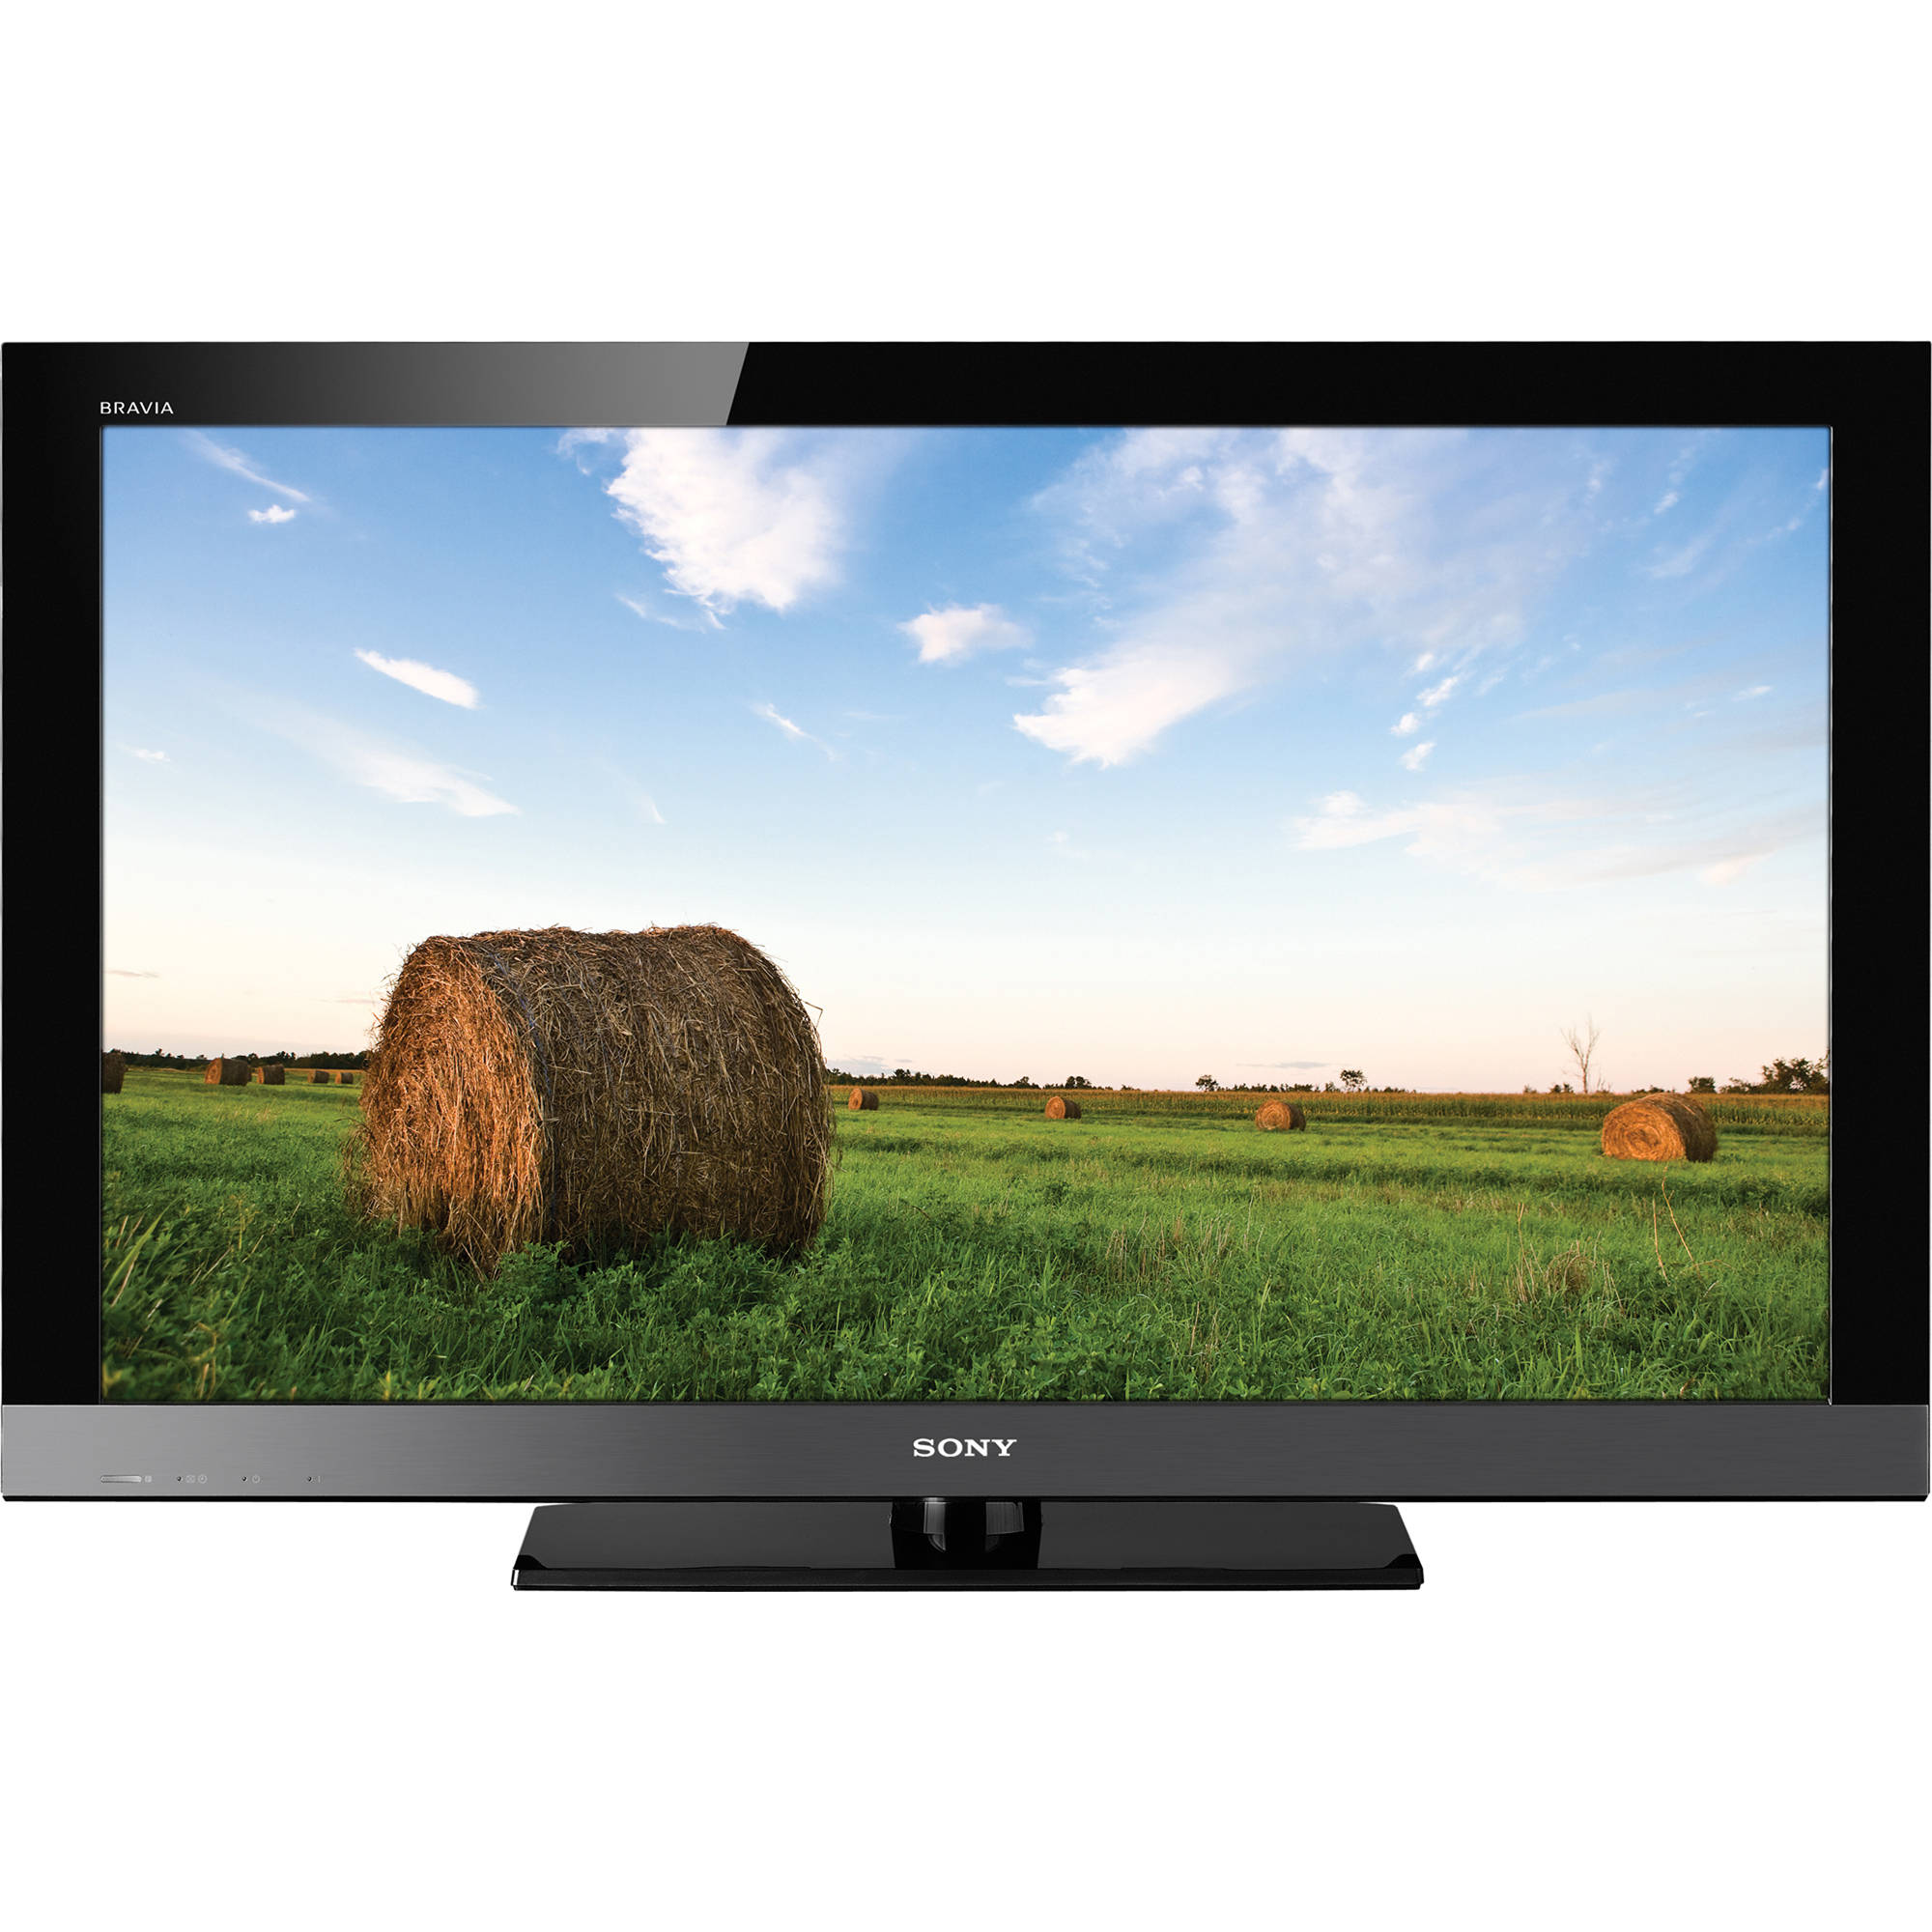 Sony BRAVIA KDL-55EX500 HDTV Windows 8